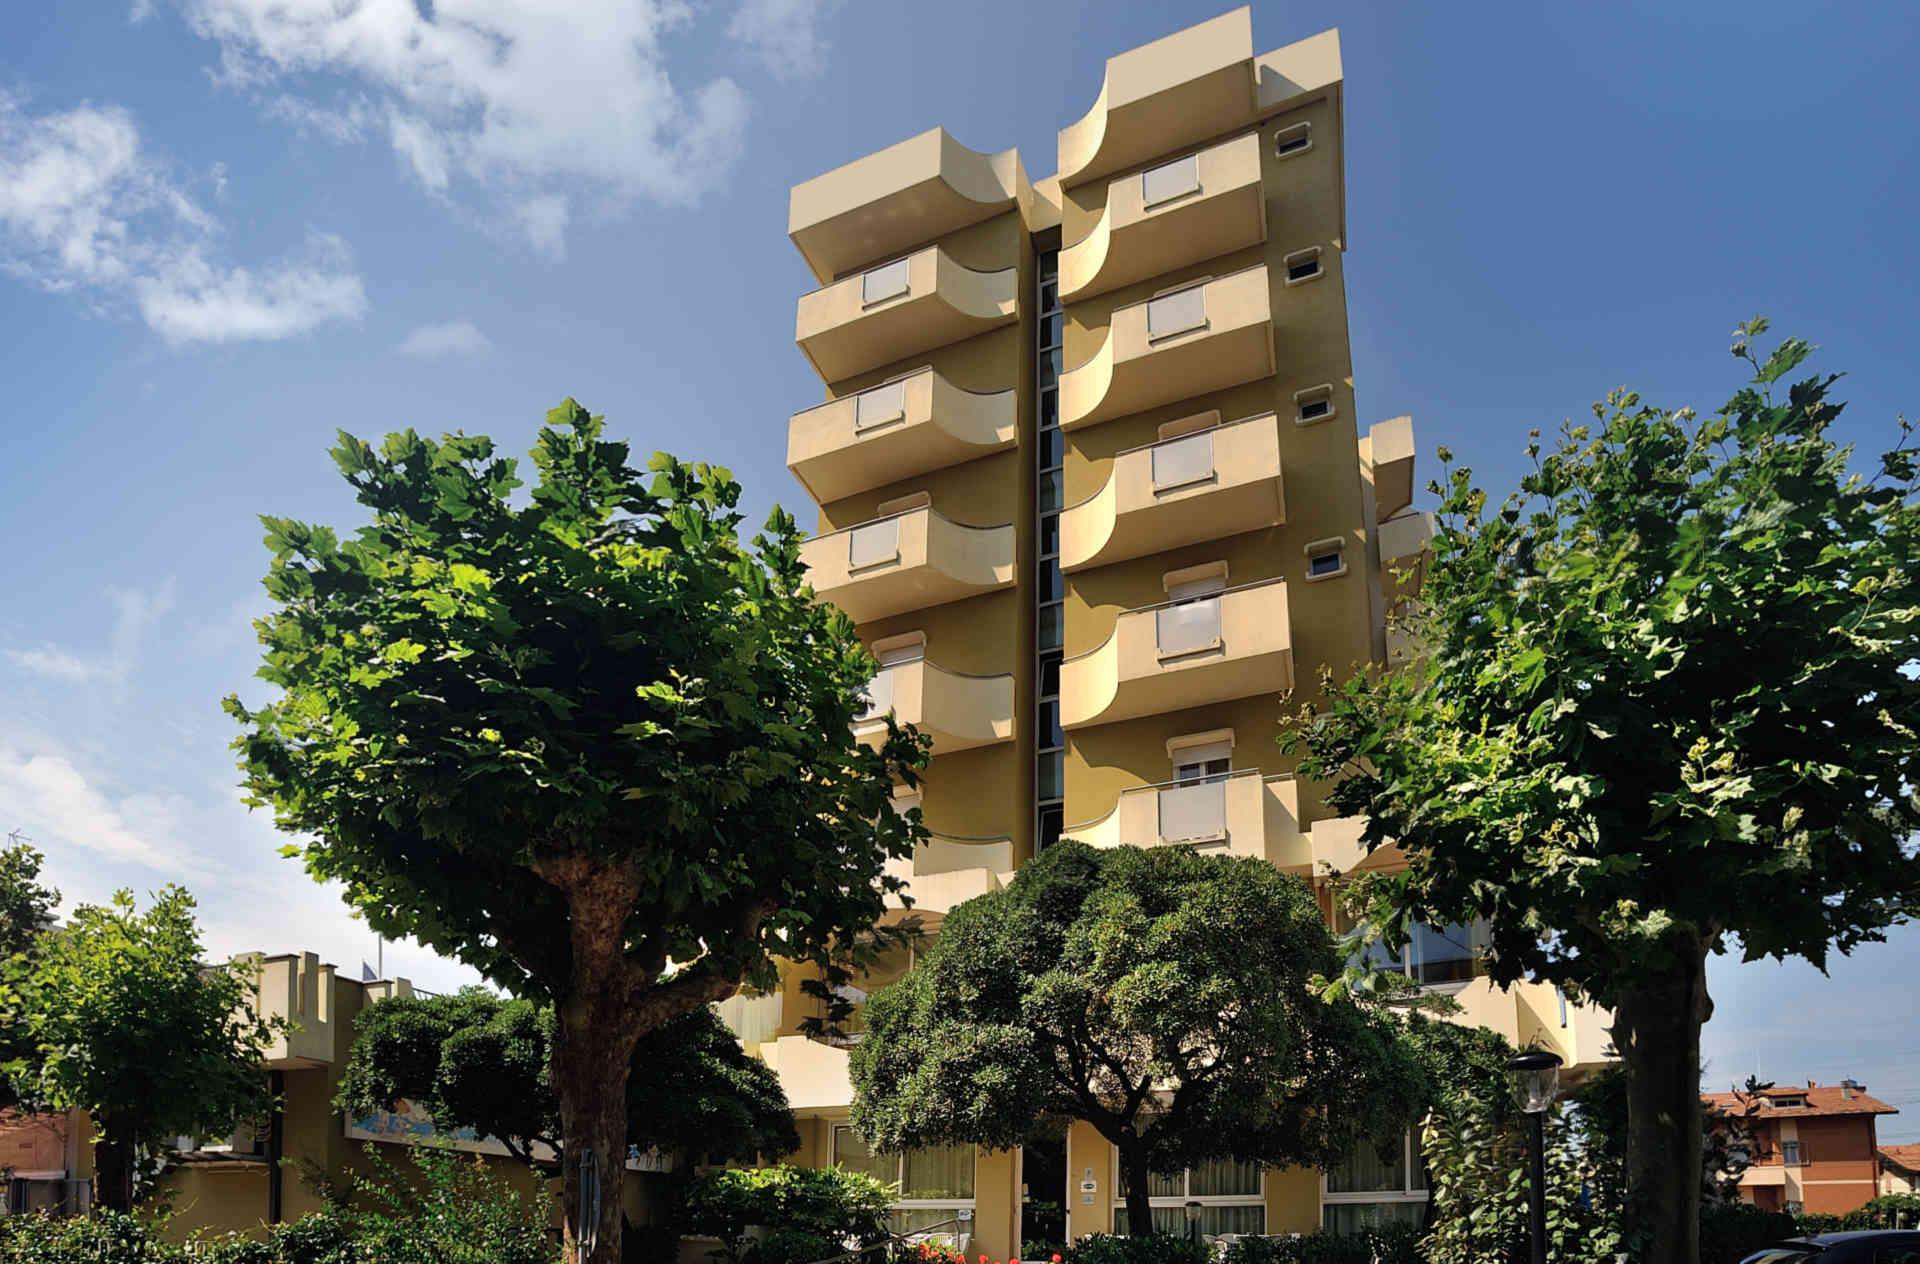 Hotel Italia Rimini Rn